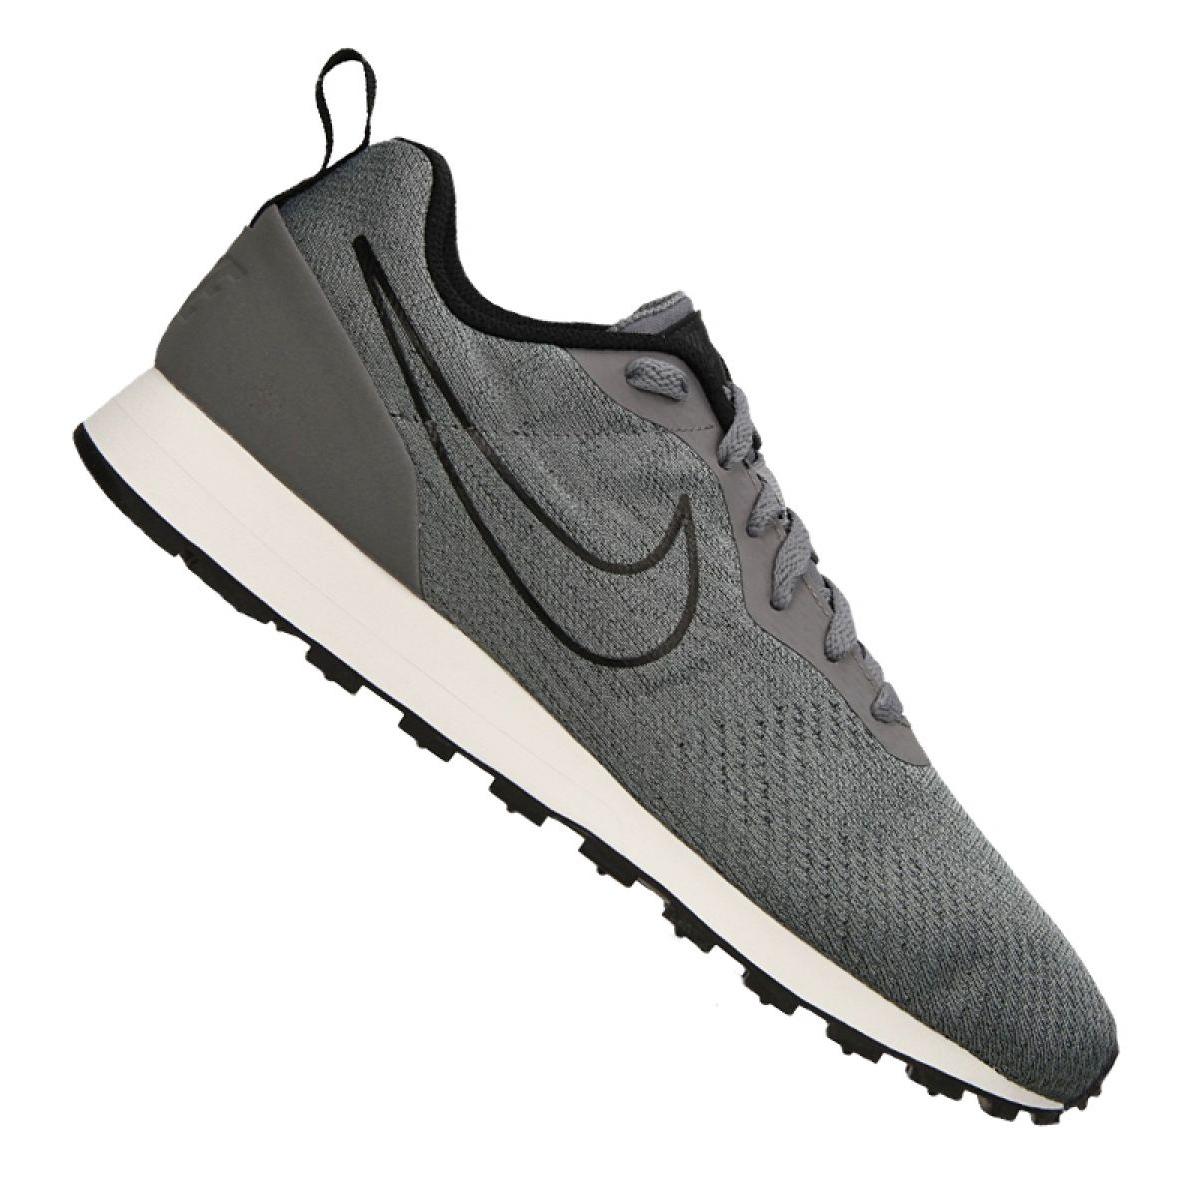 Grau Nike Md Runner 2 Eng Mesh M 916774 001 Schuhe